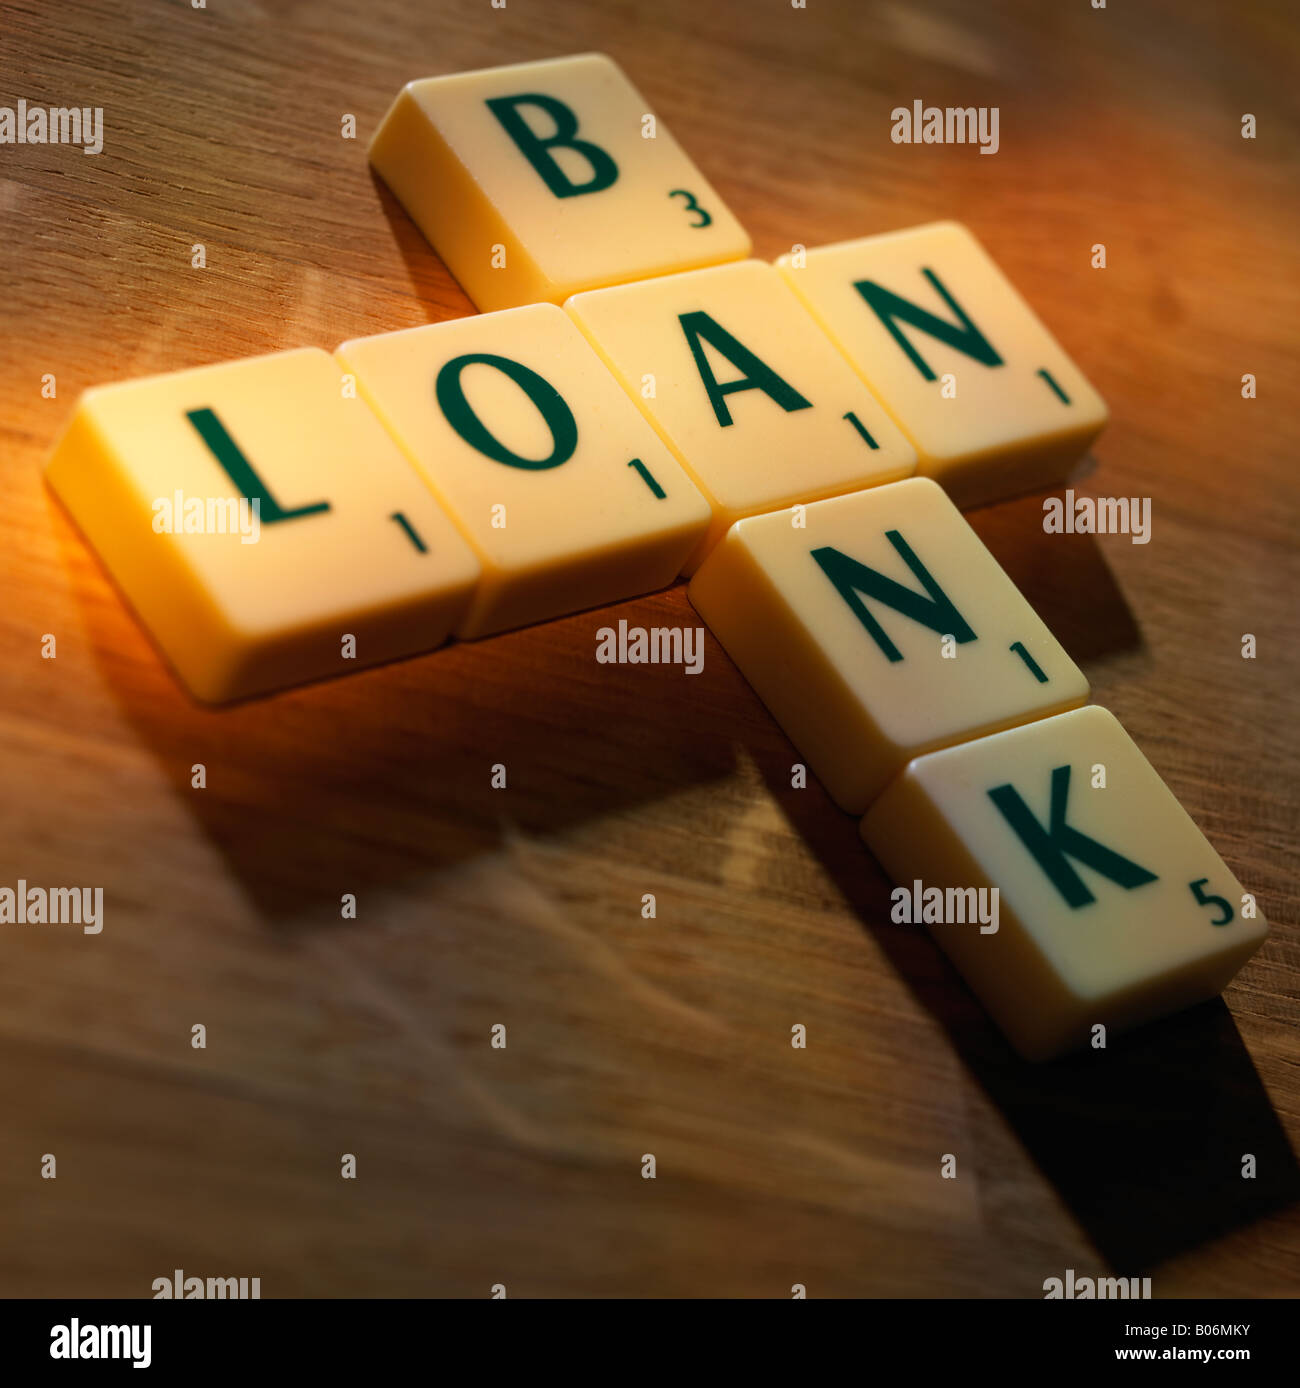 Loan Yorkshire Bank Personal